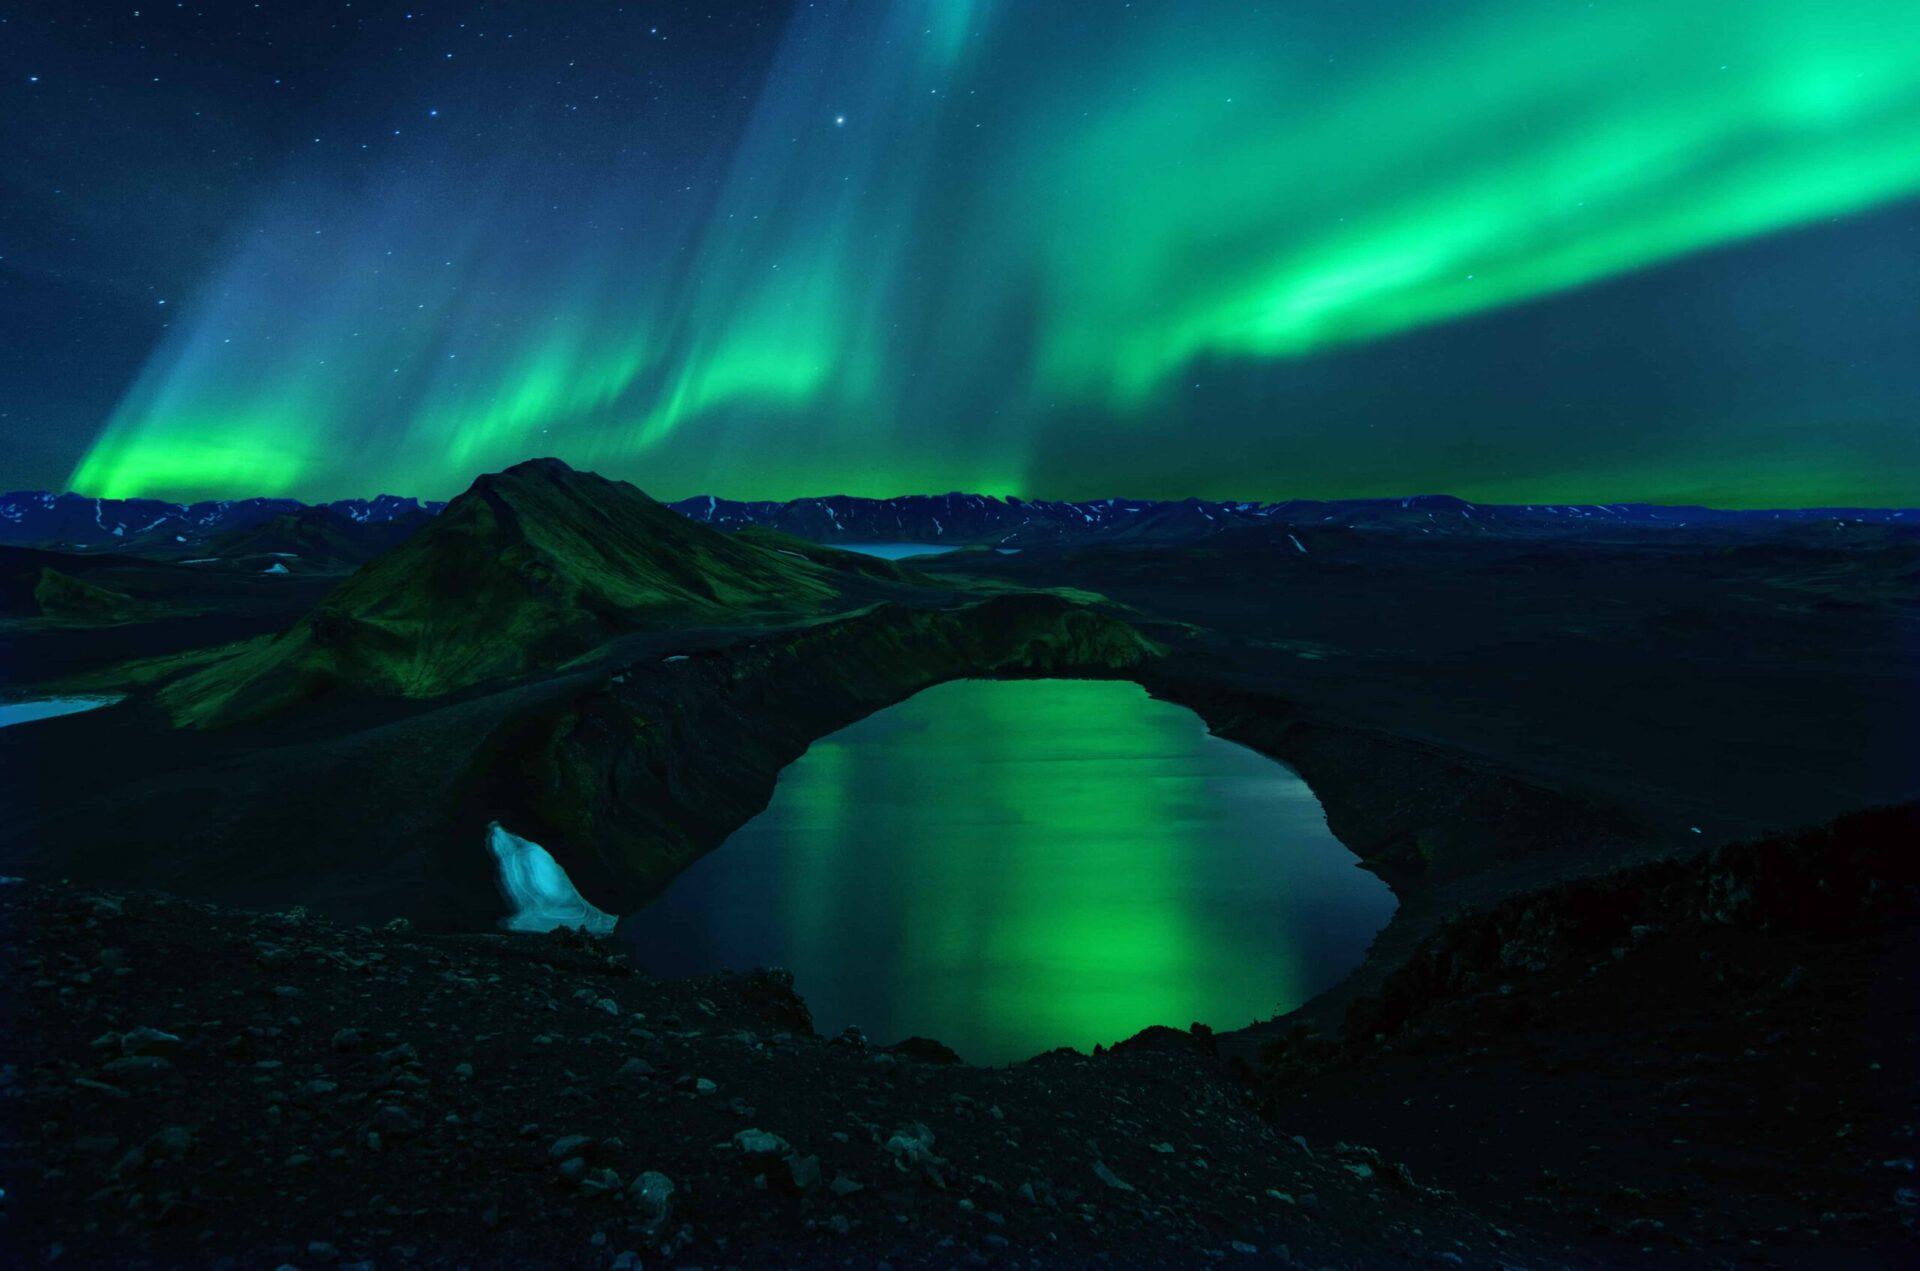 northern lights over Ljotipollur in Landmannalaugar highlands of Iceland